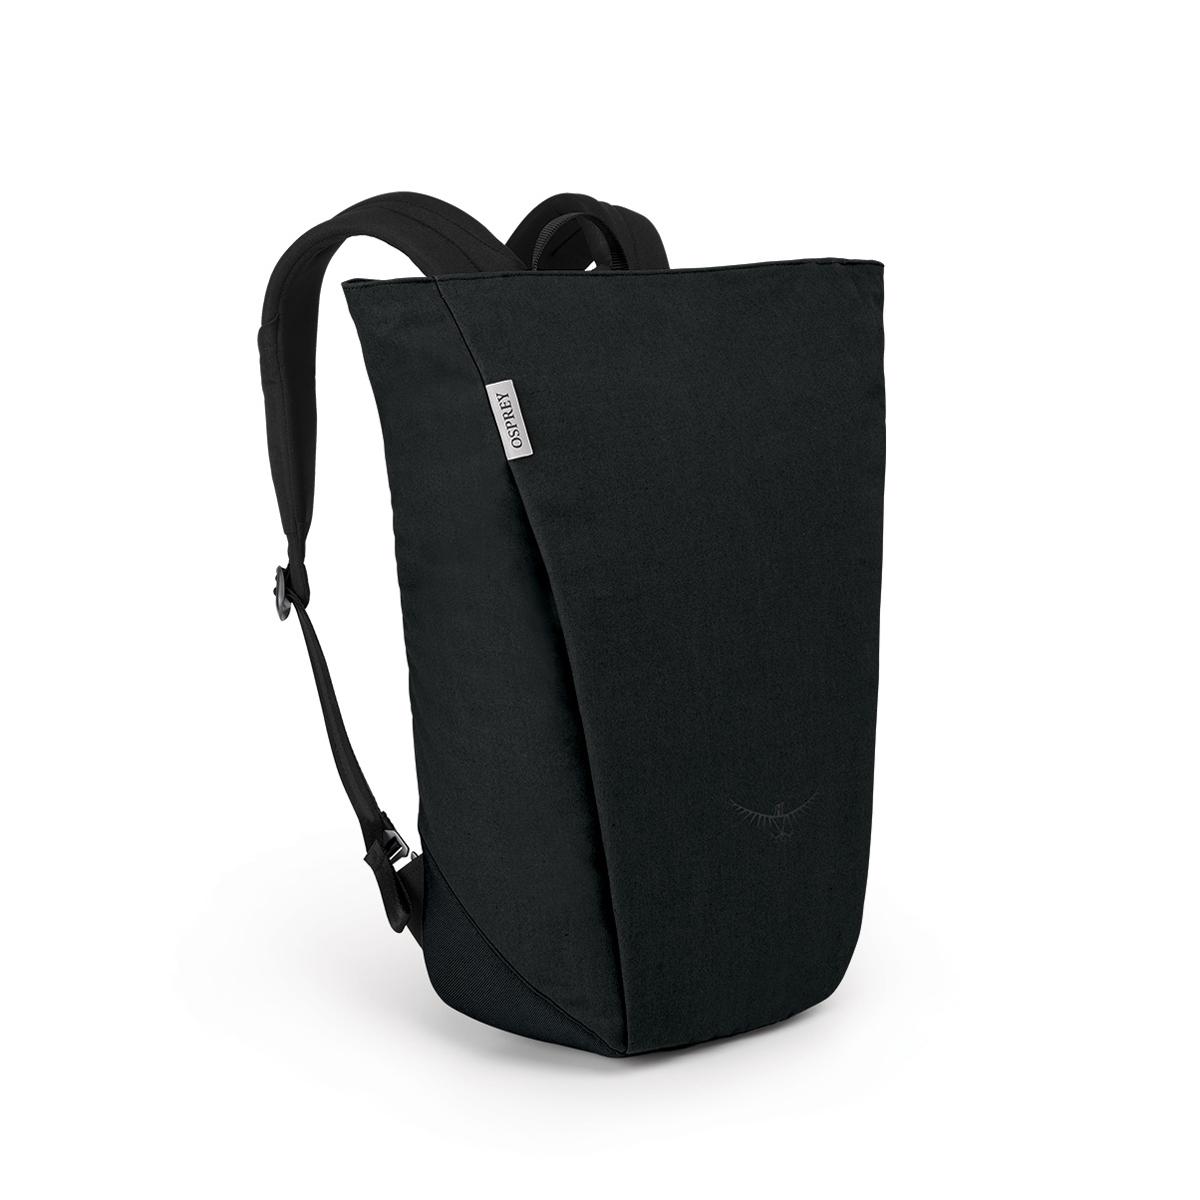 OSPREY オスプレー アーケインラージトップジップ ブラック 18L OS54015 (P10)ノートパソコン対応スリーブ(15インチ)